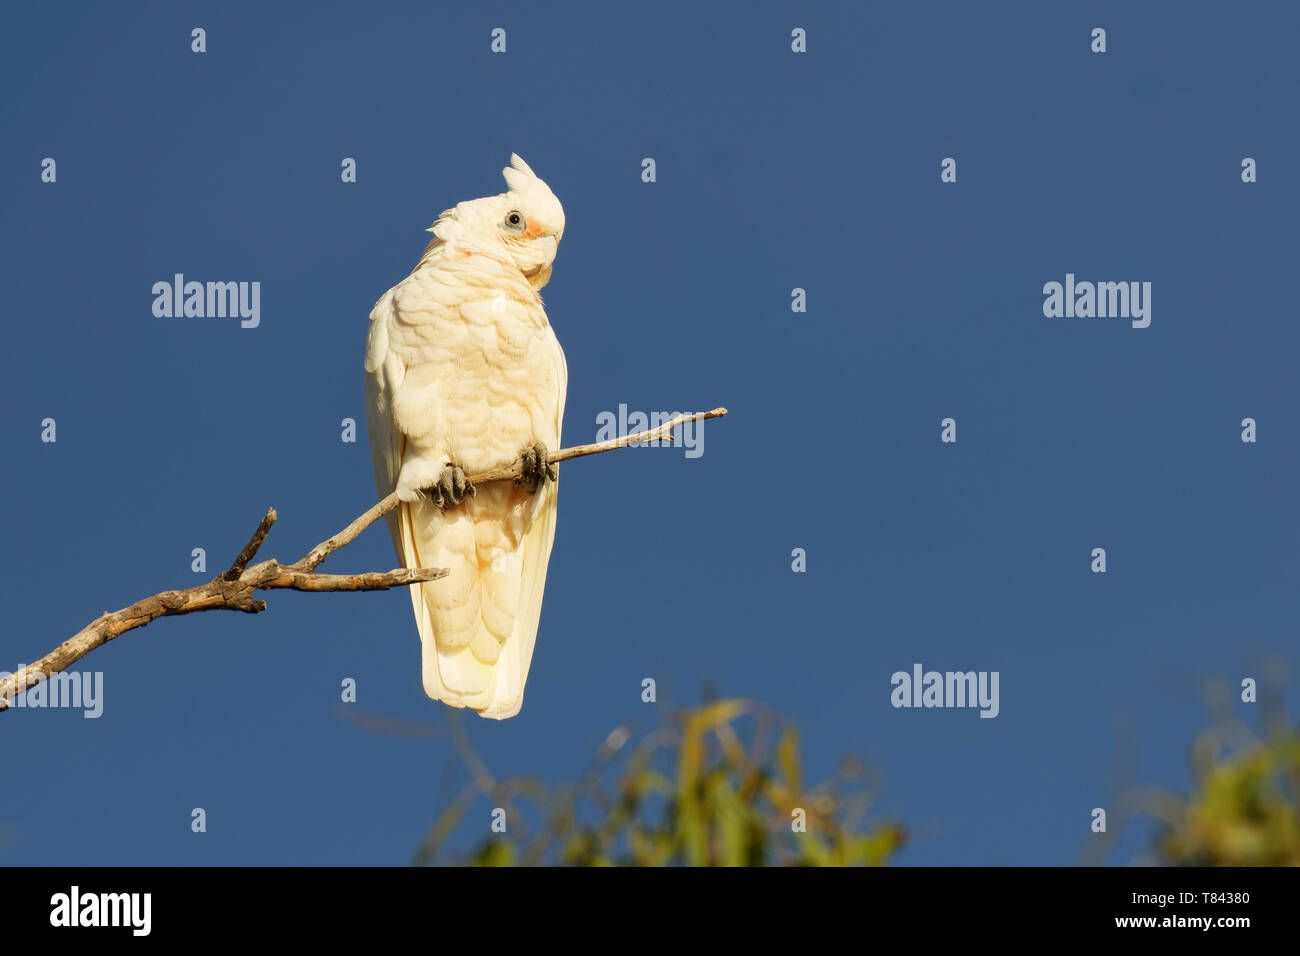 Little Corella - Cacatua sanguinea bird - feeding on the branch near Melbourne, Australia. - Stock Image